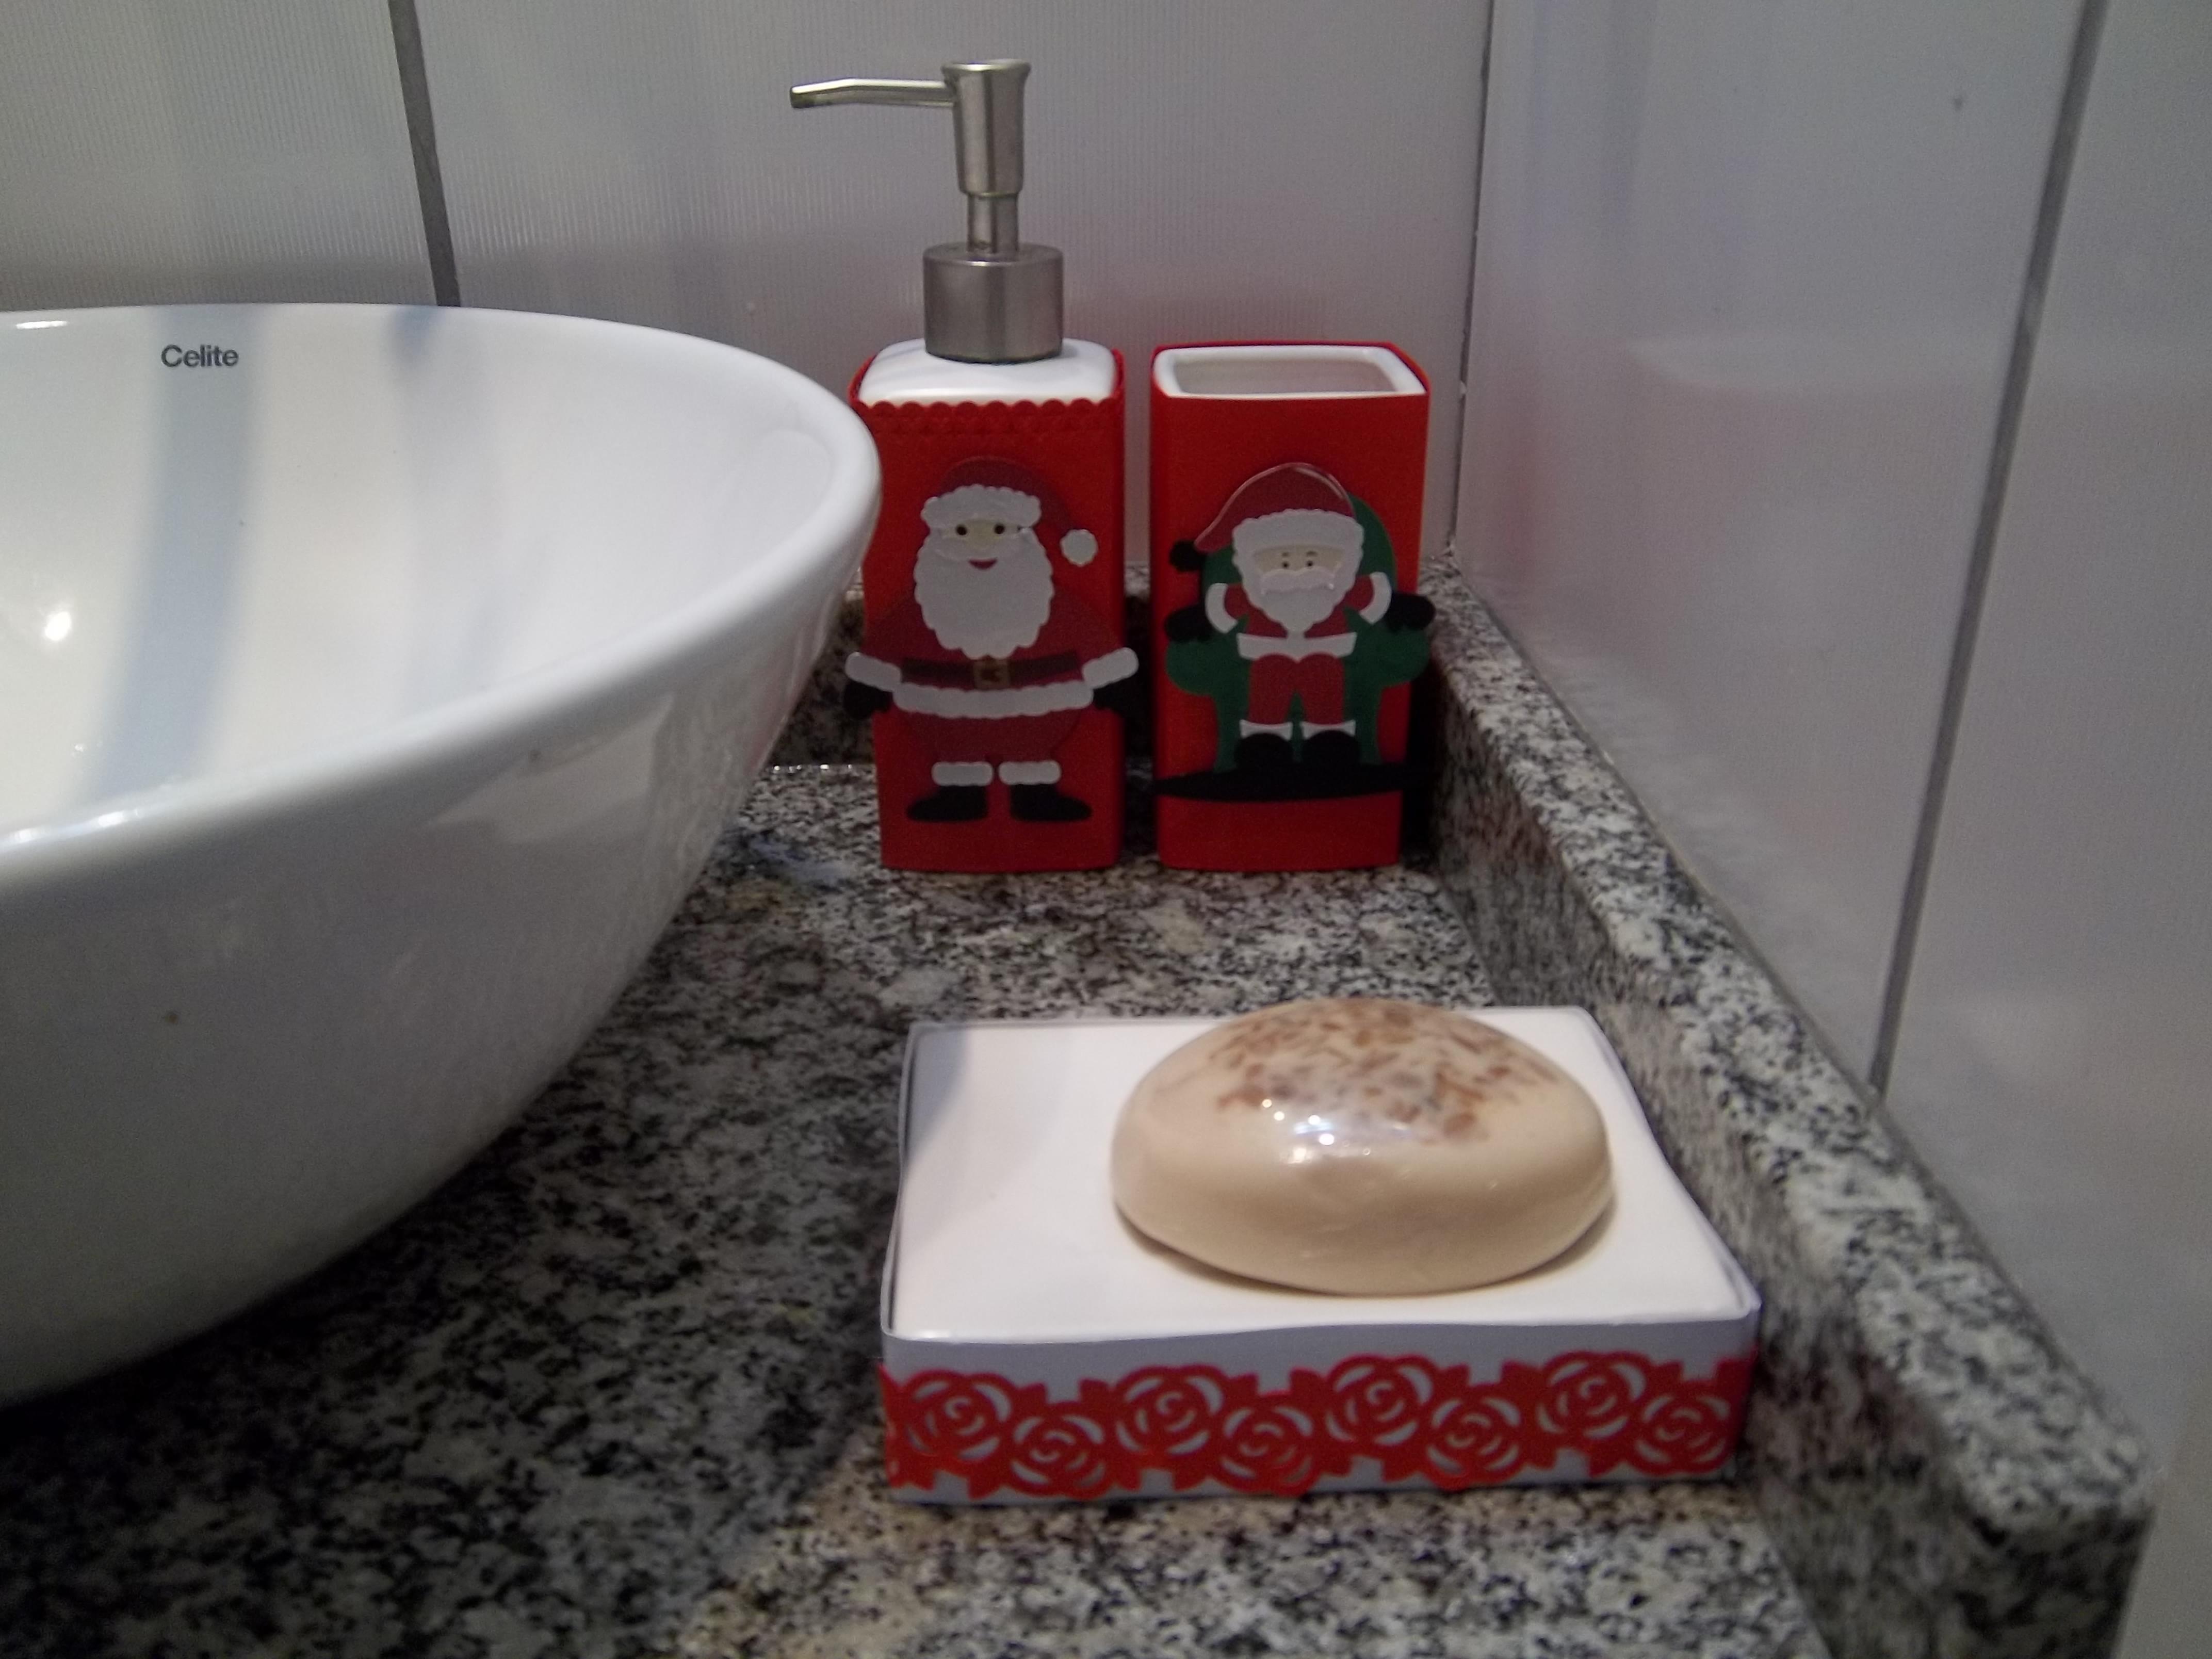 decoracao de lavabo para o natal: decoracao de natal lavabo decoracao natal decoracao de natal lavabo